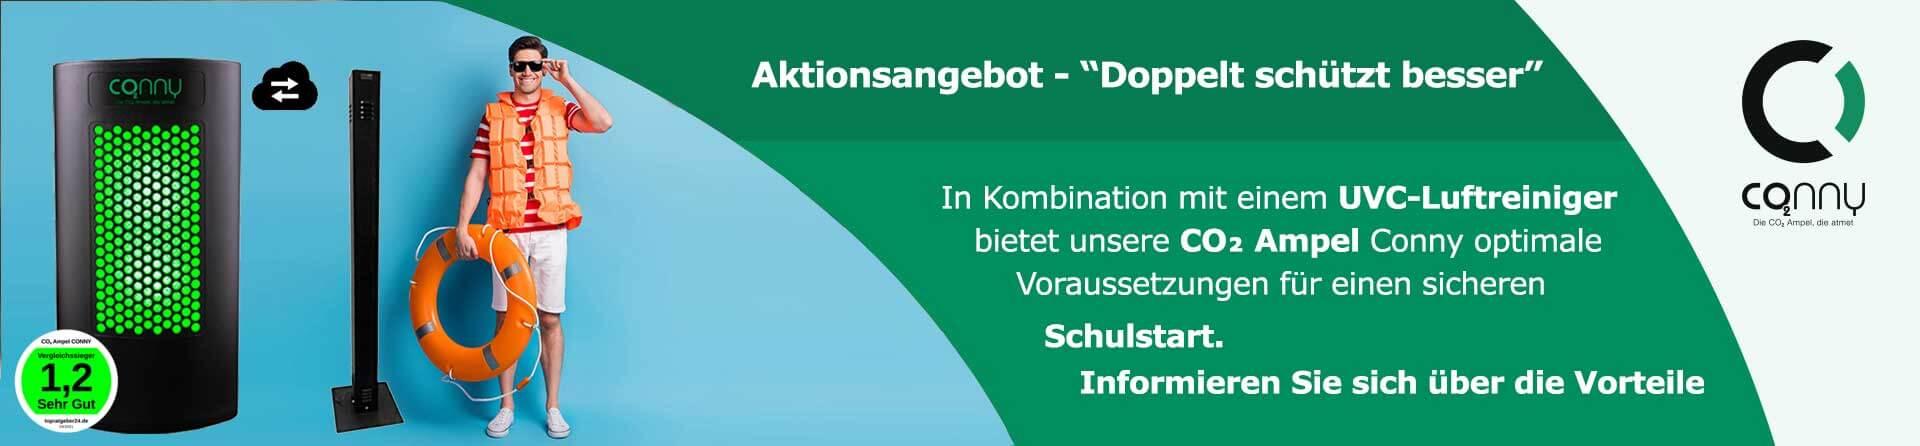 Banner_isis_Aktion-Doppelt